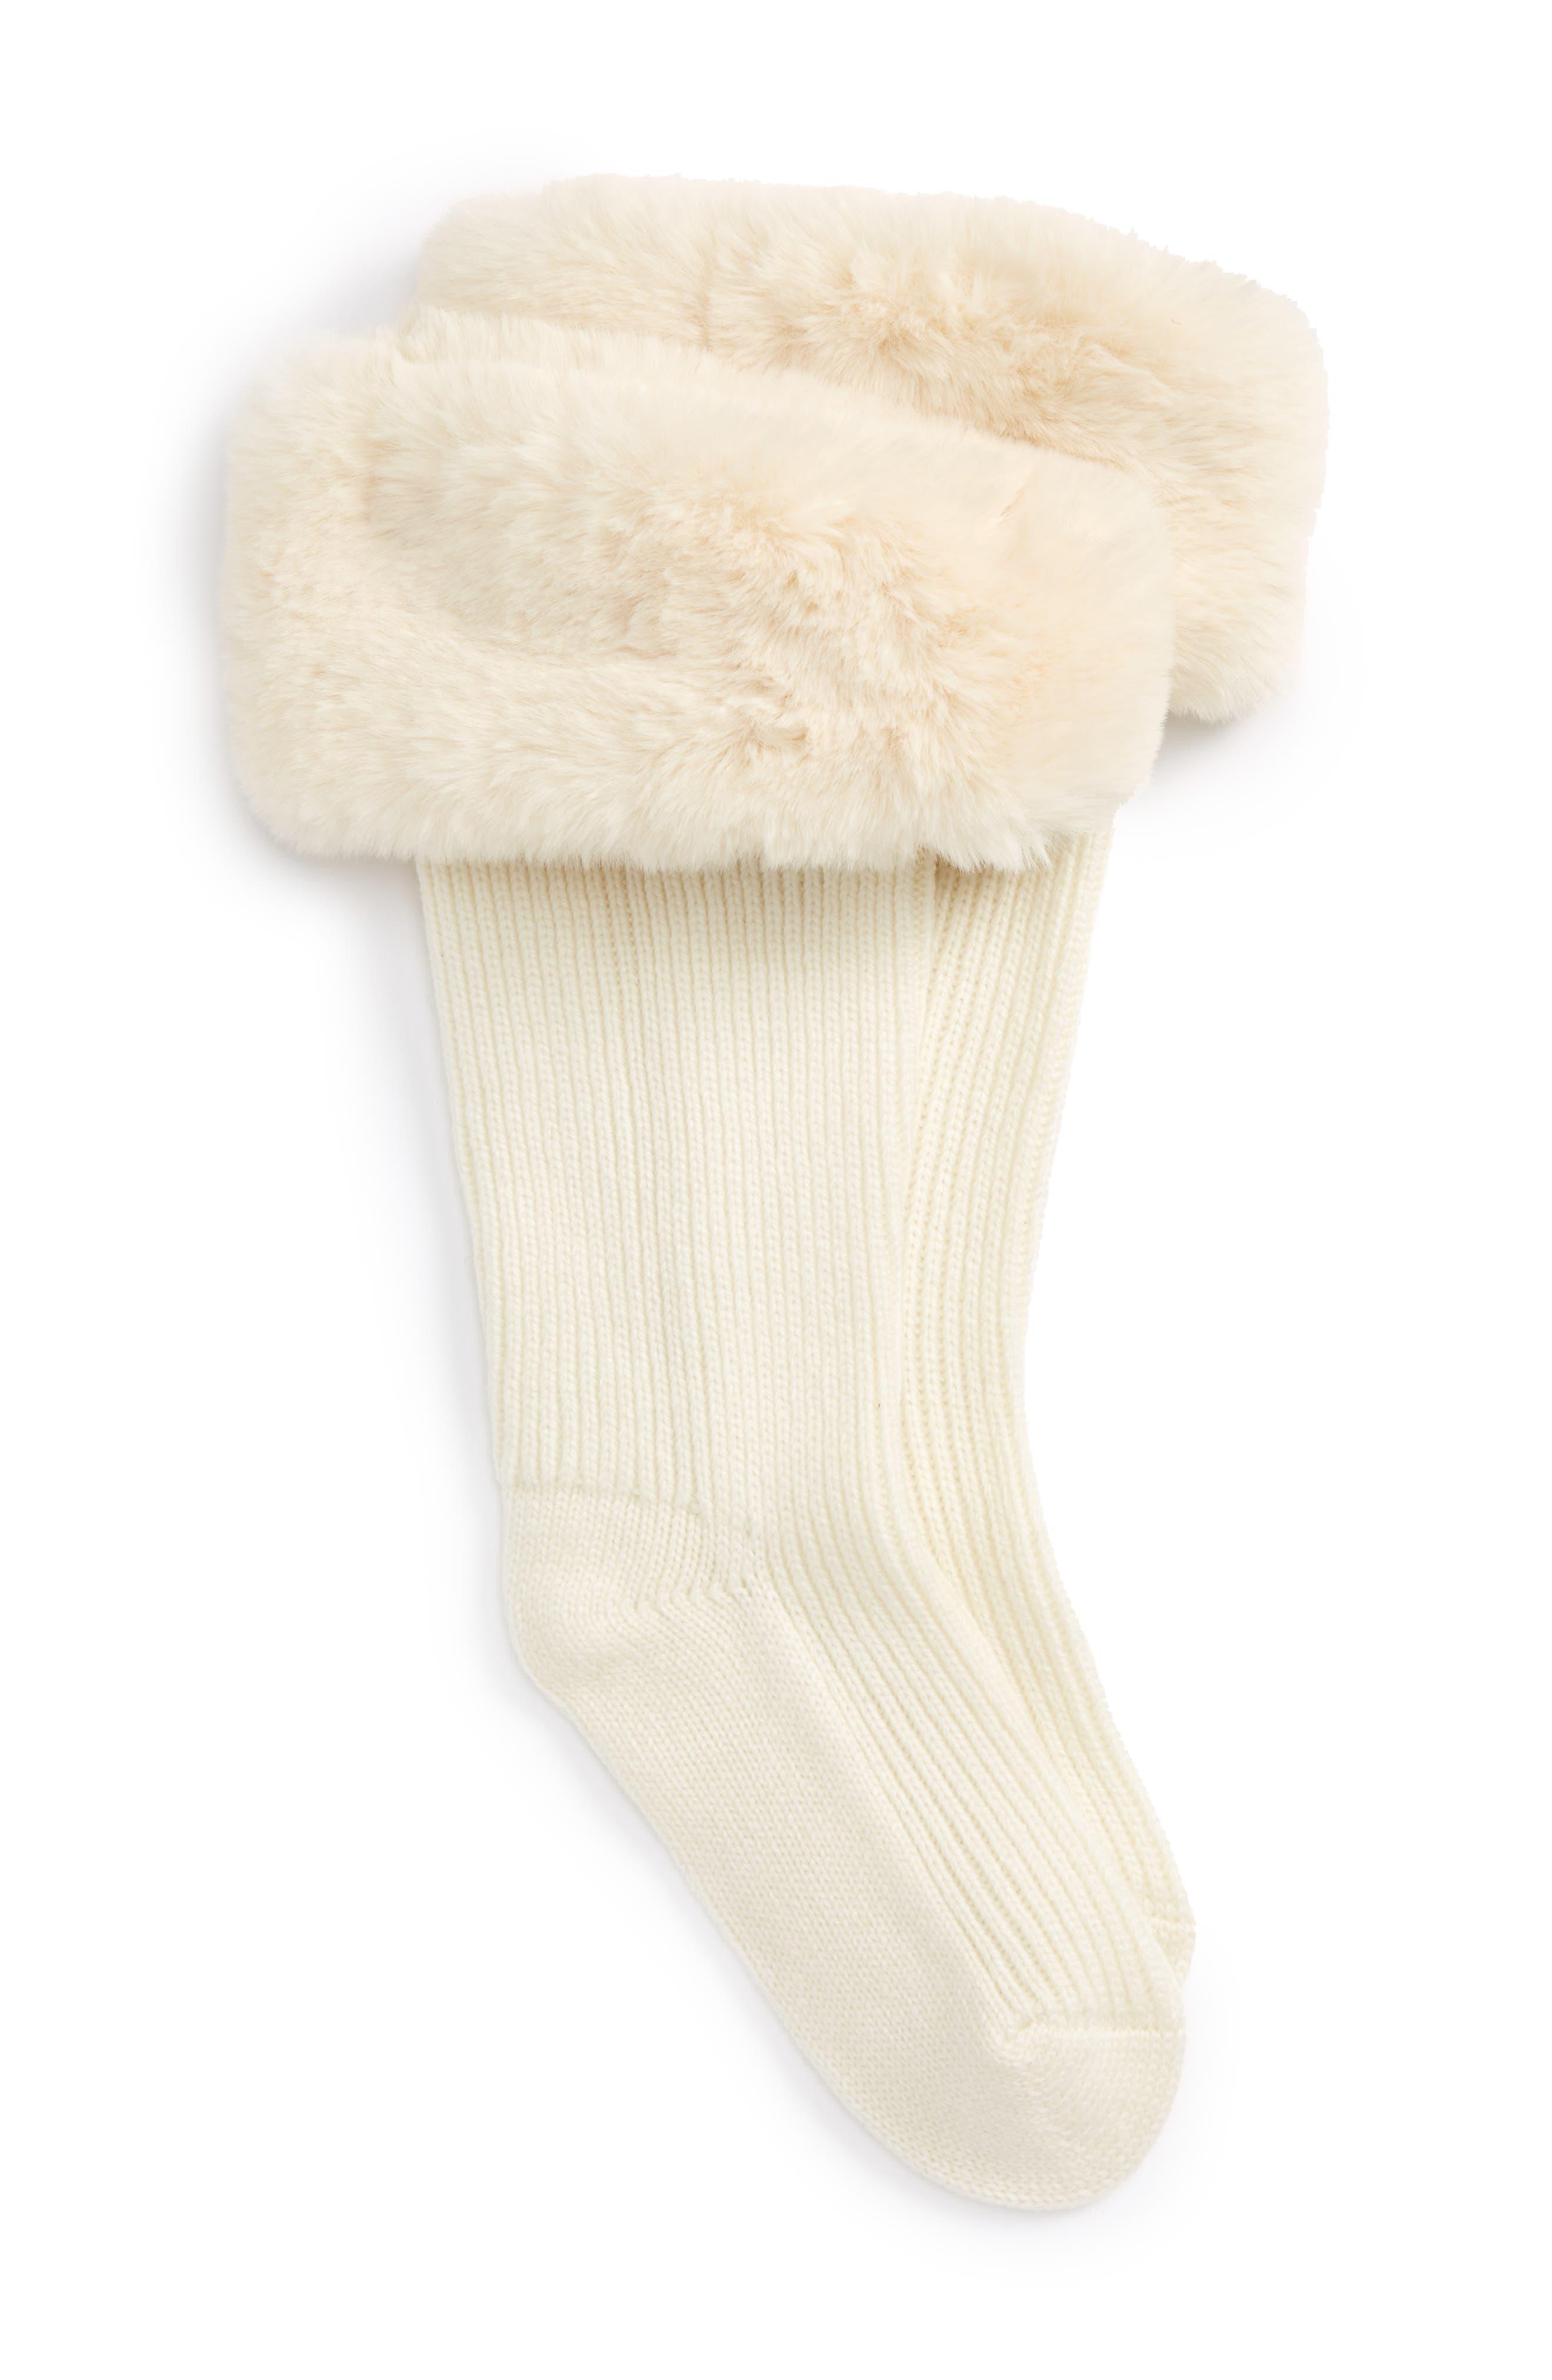 UGGpure<sup>™</sup> Tall Rain Boot Sock,                             Main thumbnail 1, color,                             CREAM WOOL